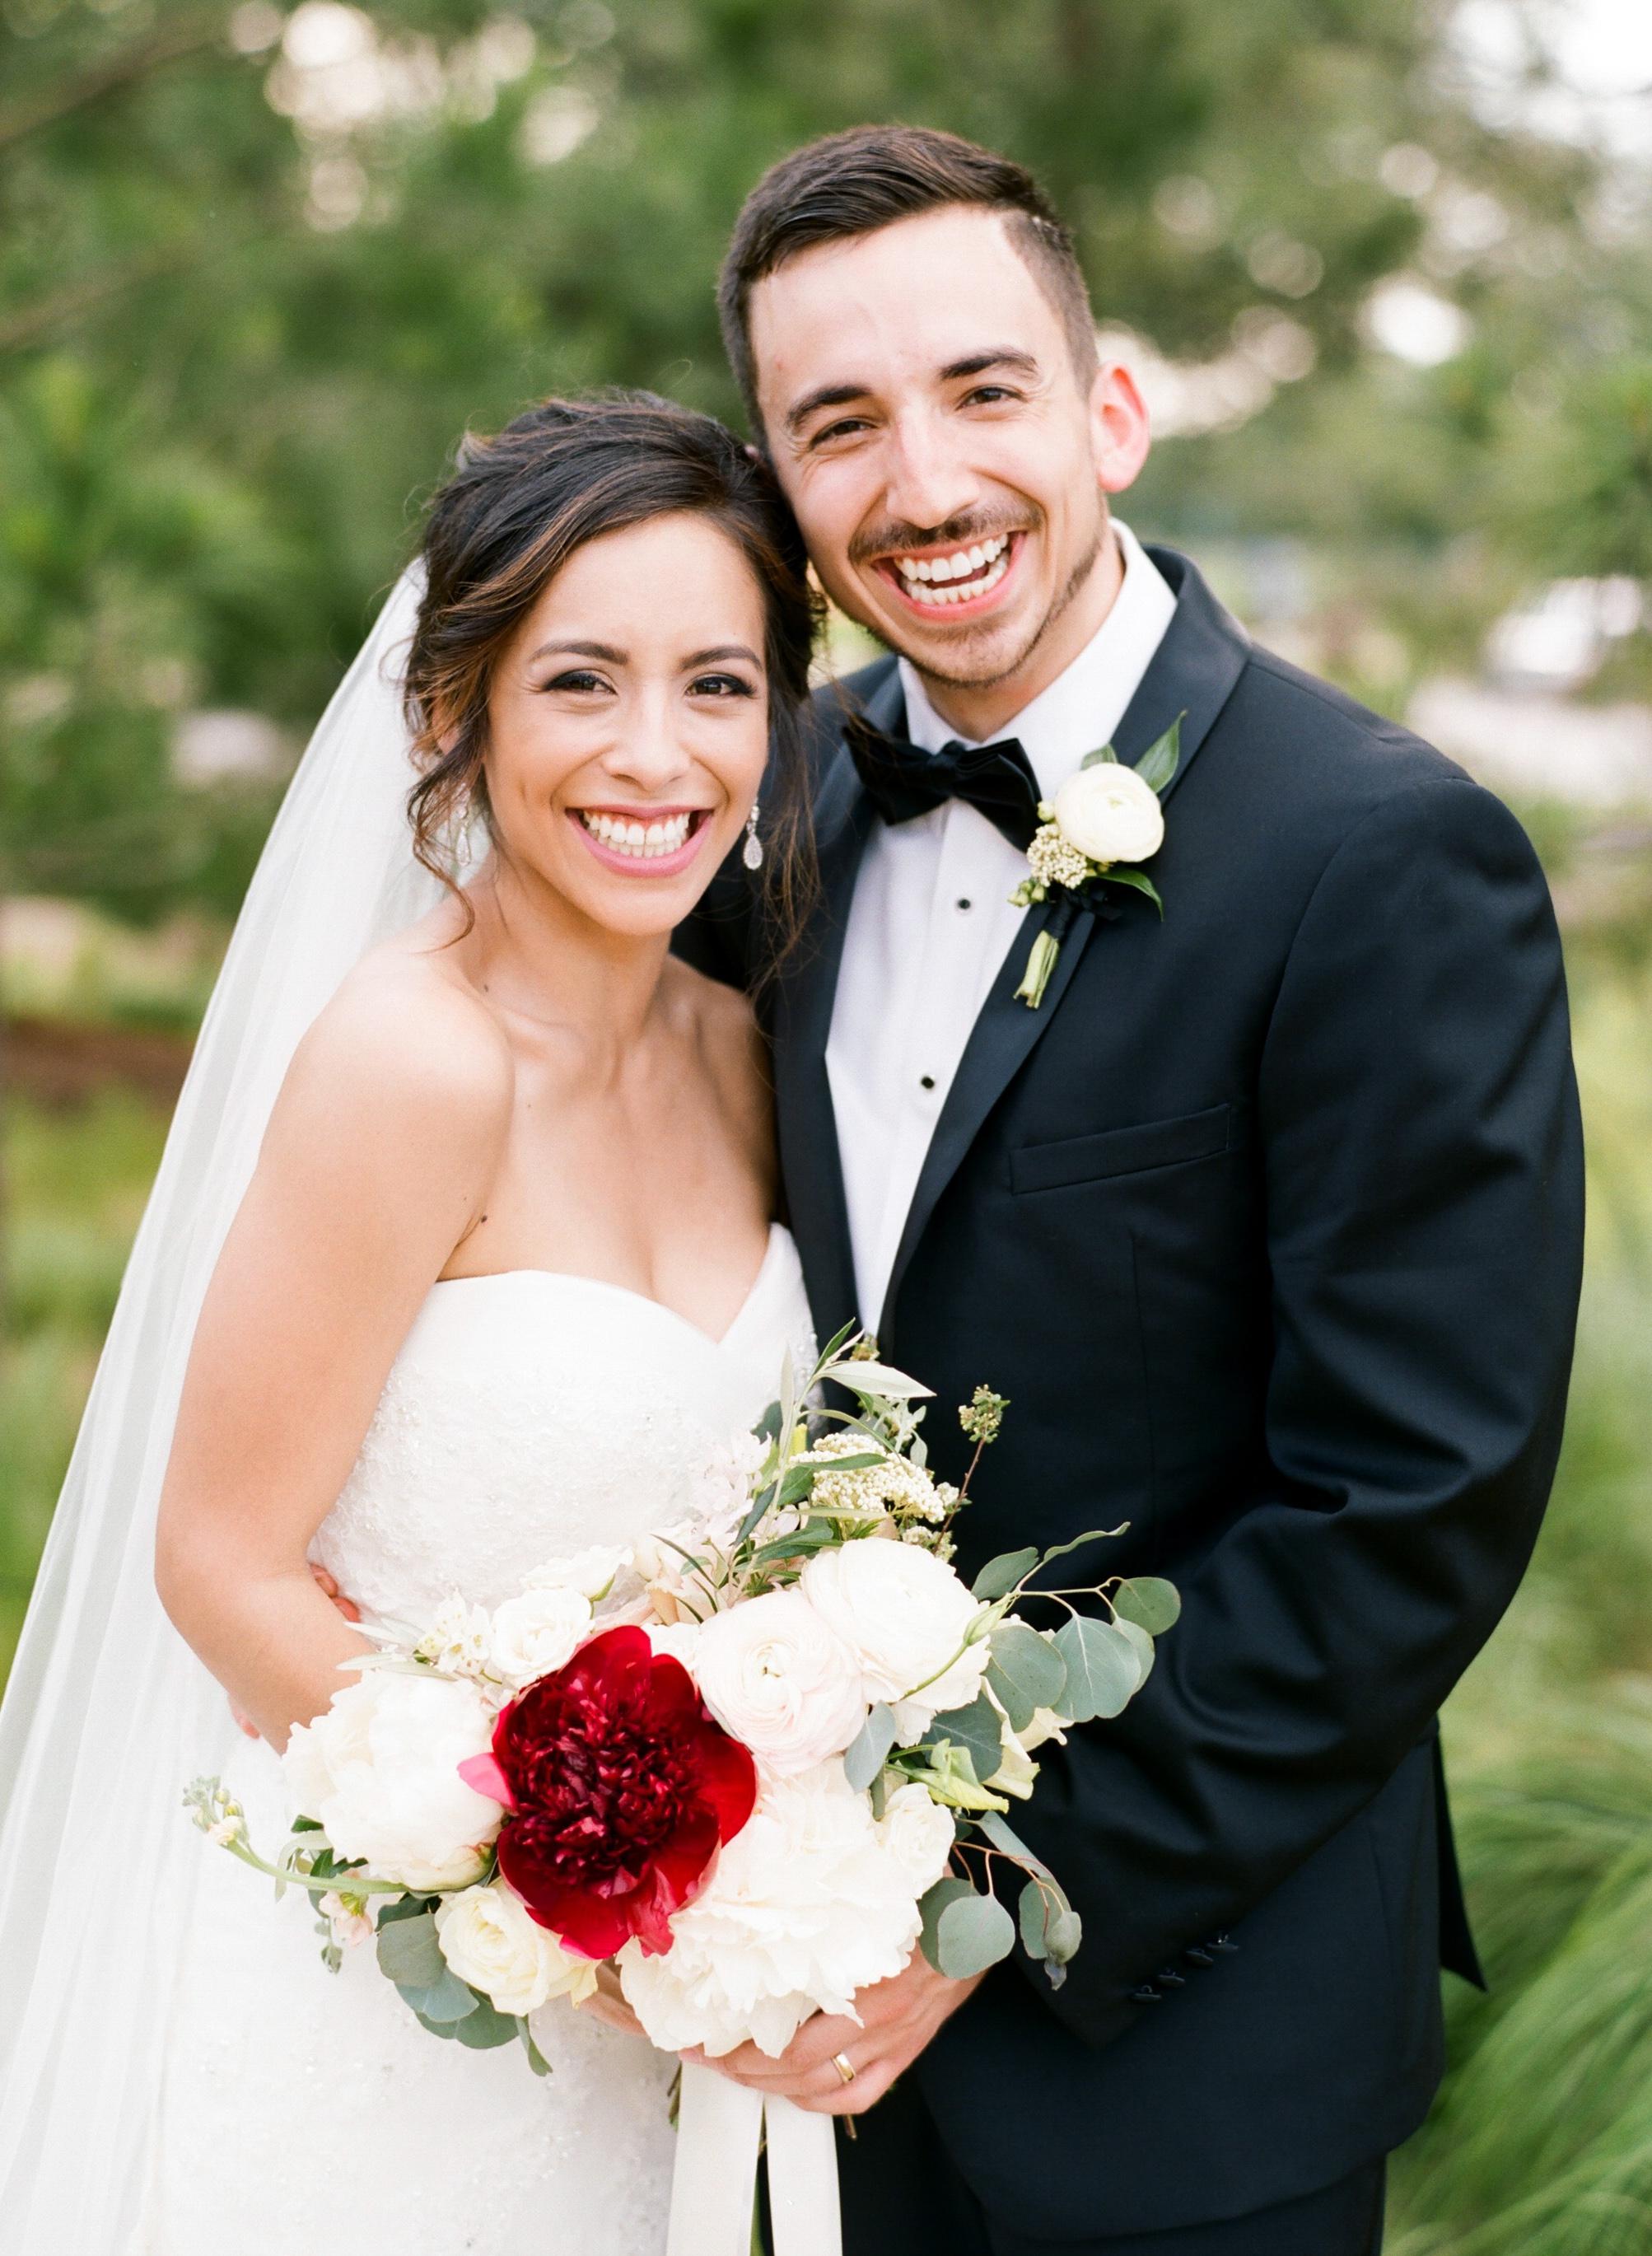 Houston-Wedding-Photography-St.-Anne-Catholic-Church-Houston-Wedding-The-Bell-Tower-on-34th-reception-wedding-film-22.jpg